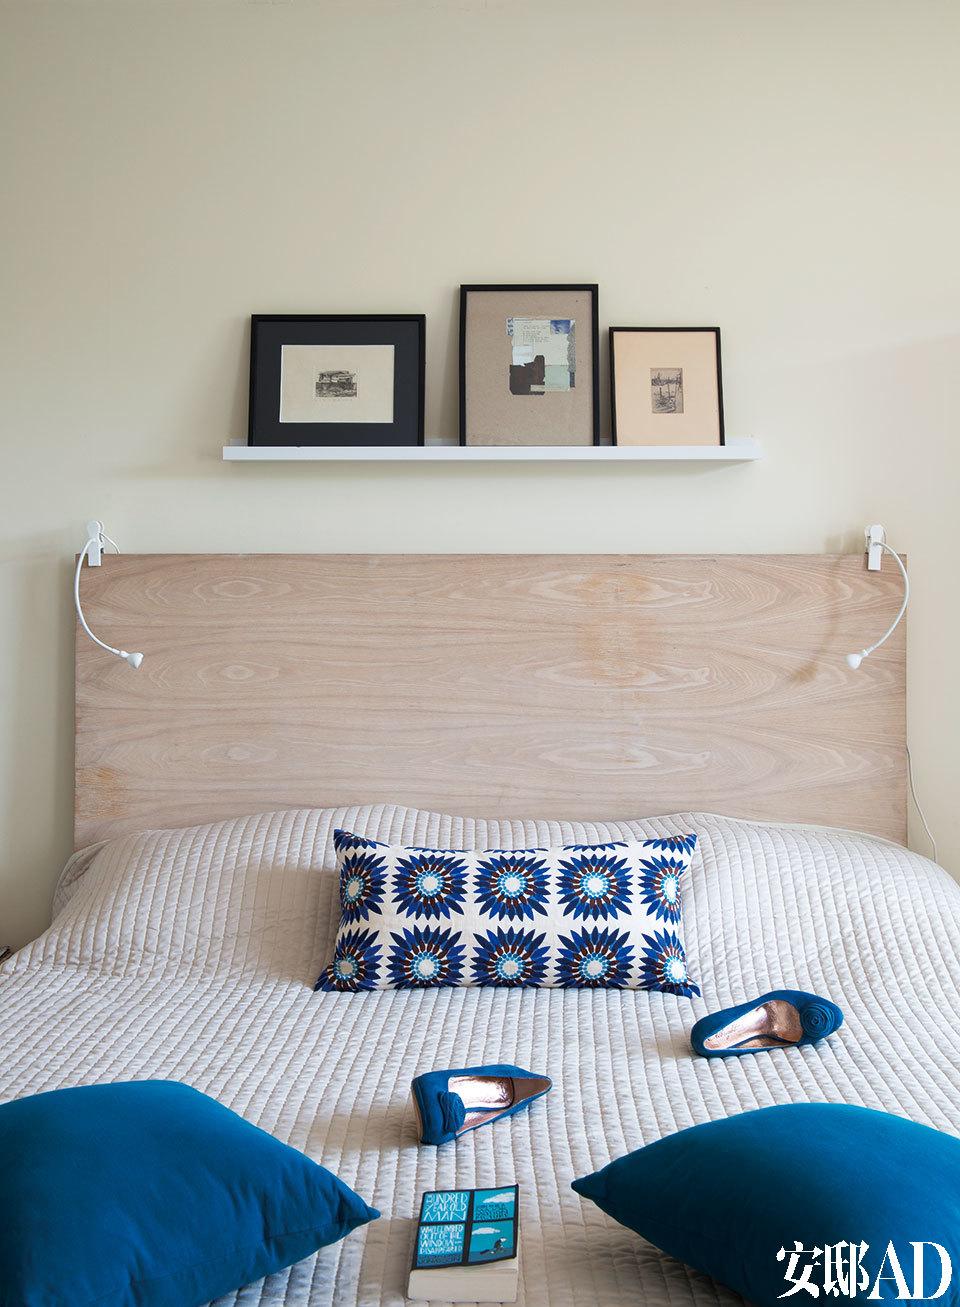 Targett夫妇的主卧室中,床上的蓝白花纹抱枕由Chang & Biorck出品,蓝色靠垫则是Trine自己制作的。